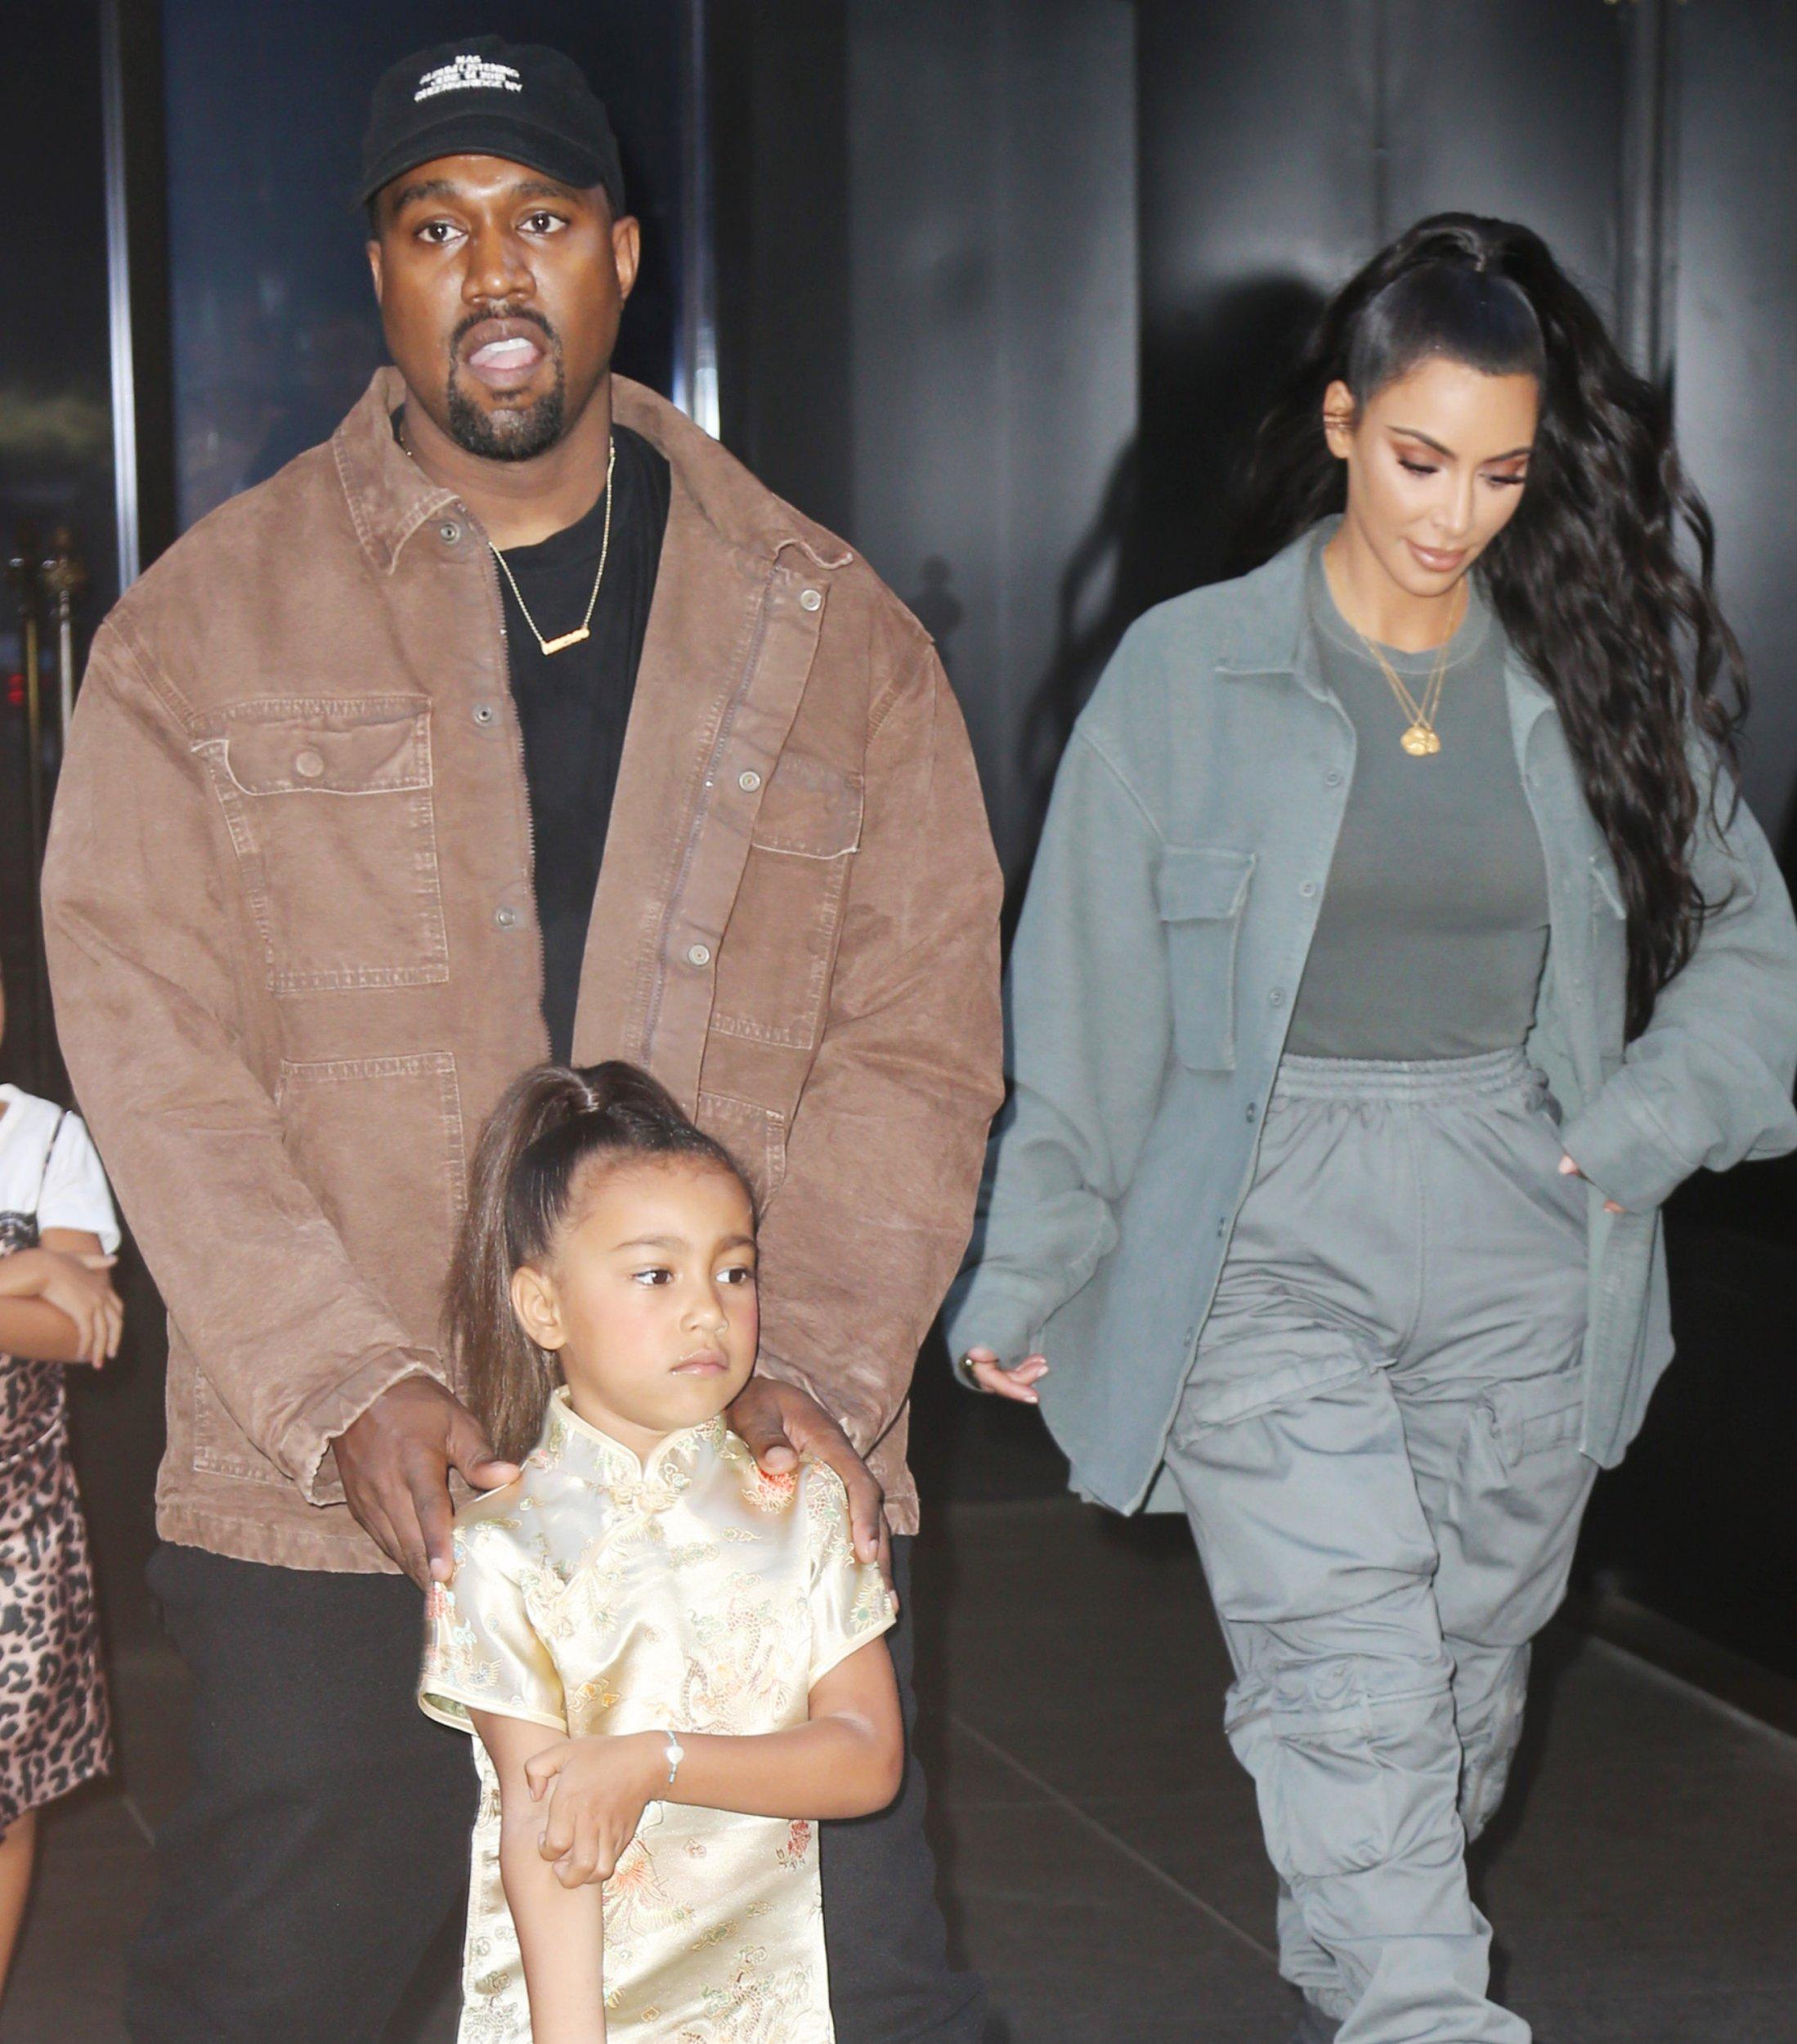 Kanye West wife Kim Kardashian with North West together in New York. 15 Jun 2018 Pictured: Kim Kardashian, Kanye West, North West. Photo credit: TPG/MEGA TheMegaAgency.com +1 888 505 6342